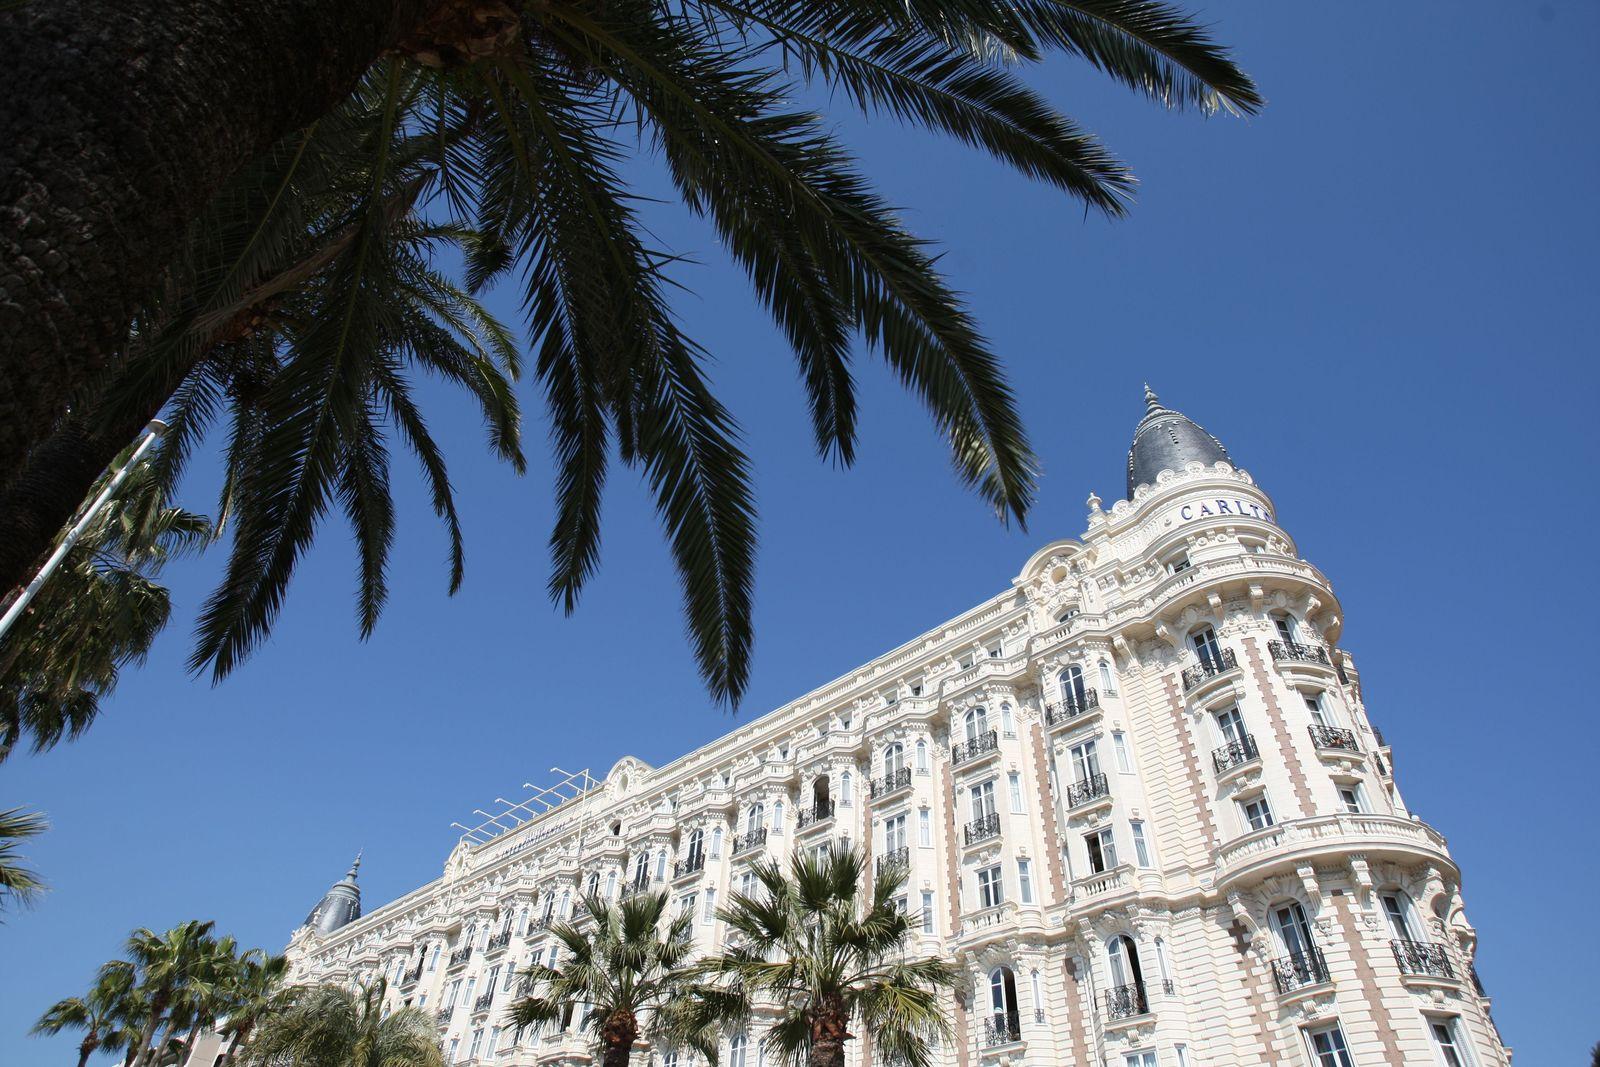 Luxushotel Carlton in Cannes